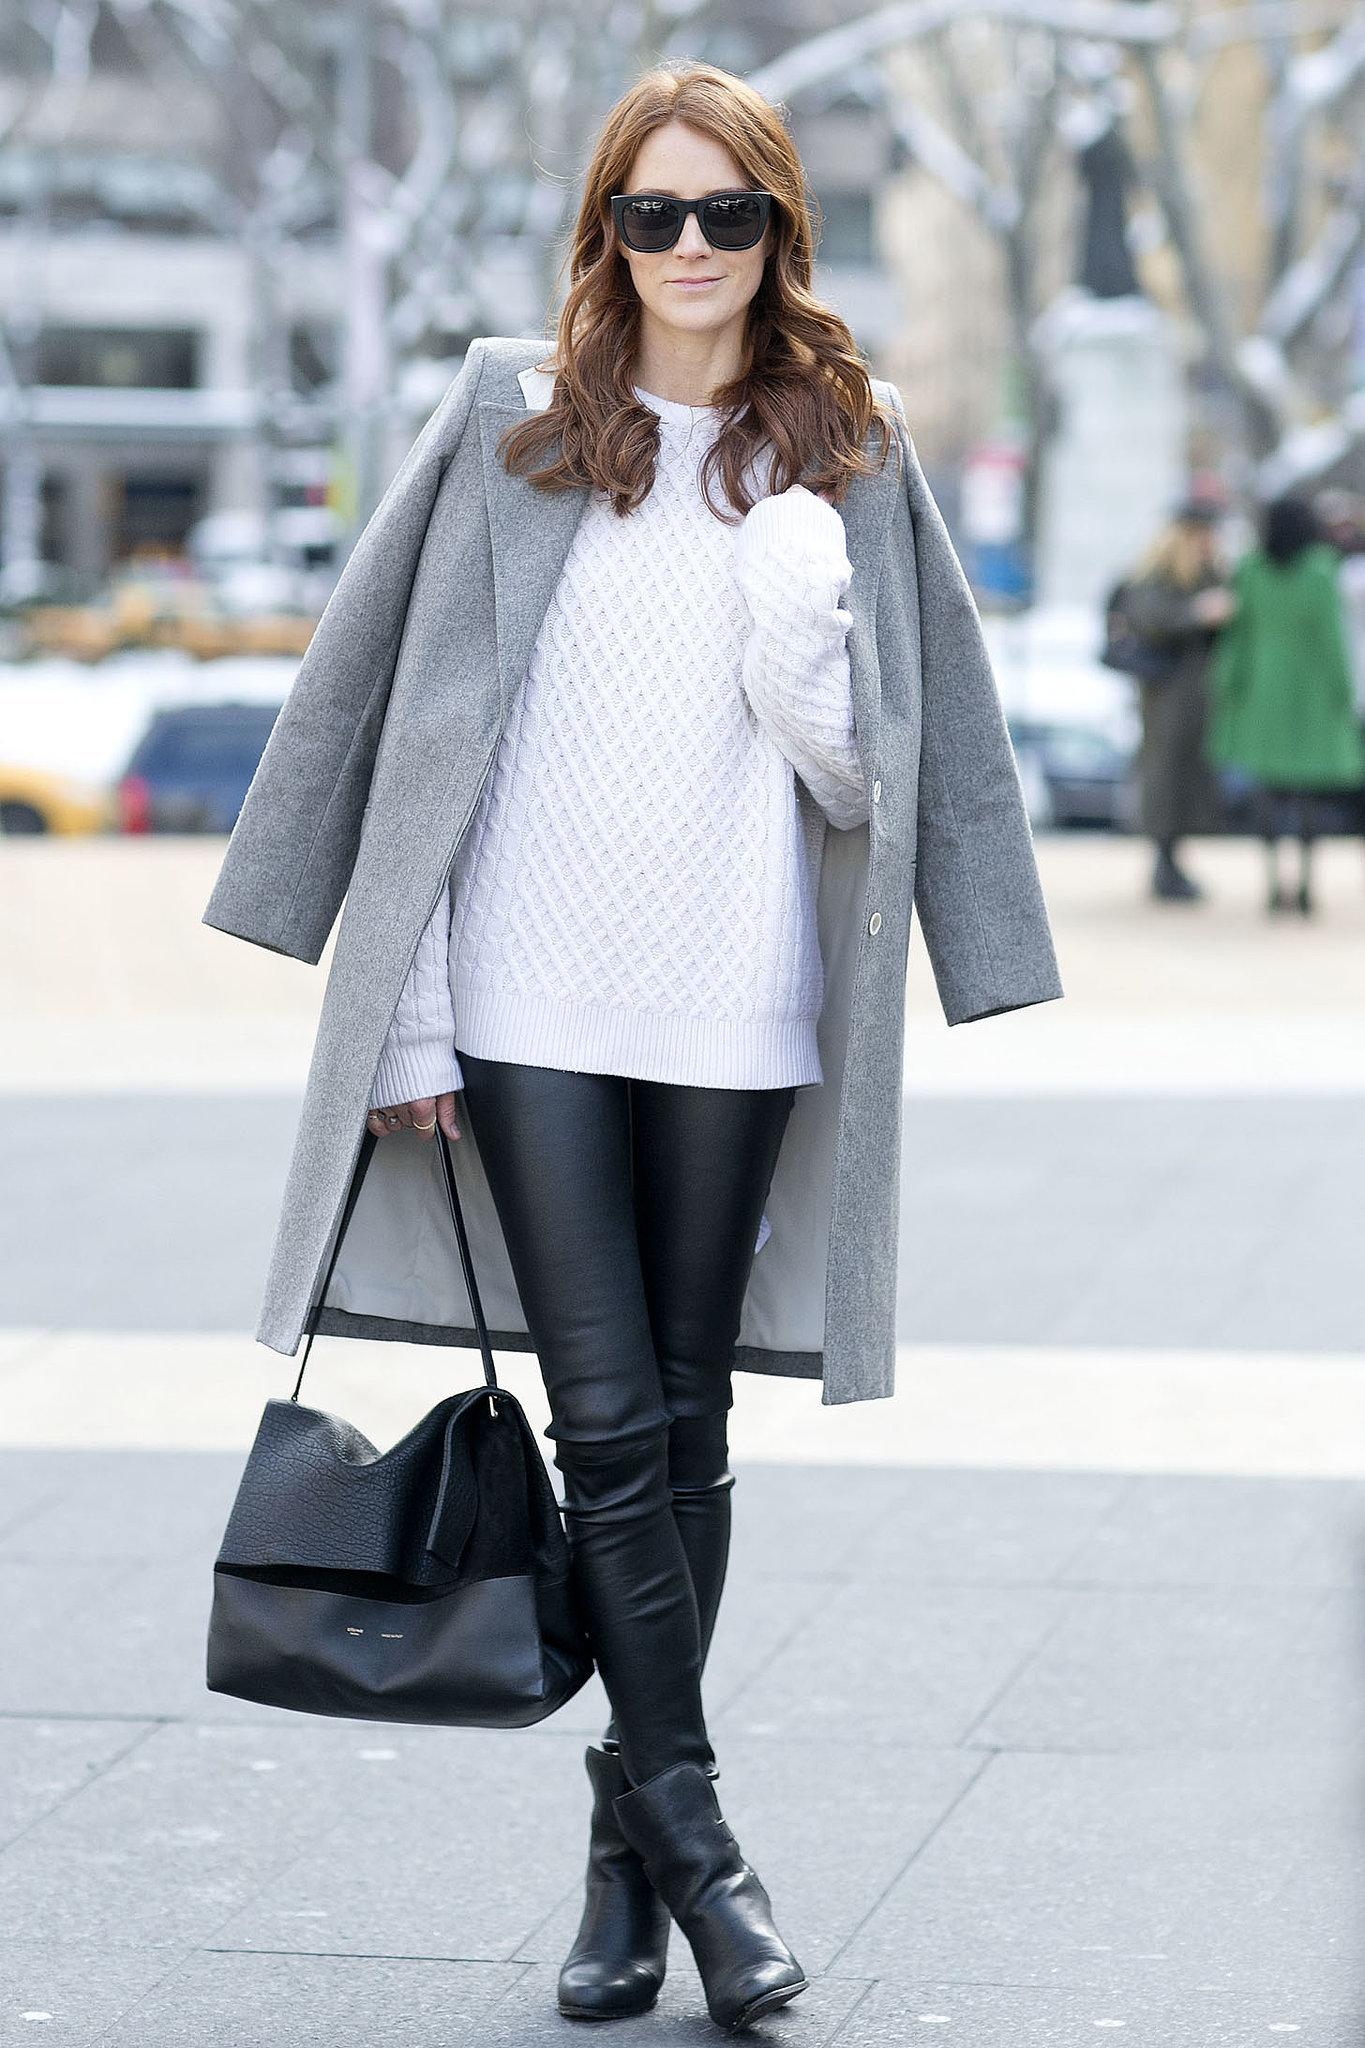 http://media3.onsugar.com/files/2014/02/07/662/n/1922564/caa075de48ac5031_NYStreet1_FW14_013.JPG.xxxlarge_2x/i/NYFW-Street-Style-Day-1.jpg